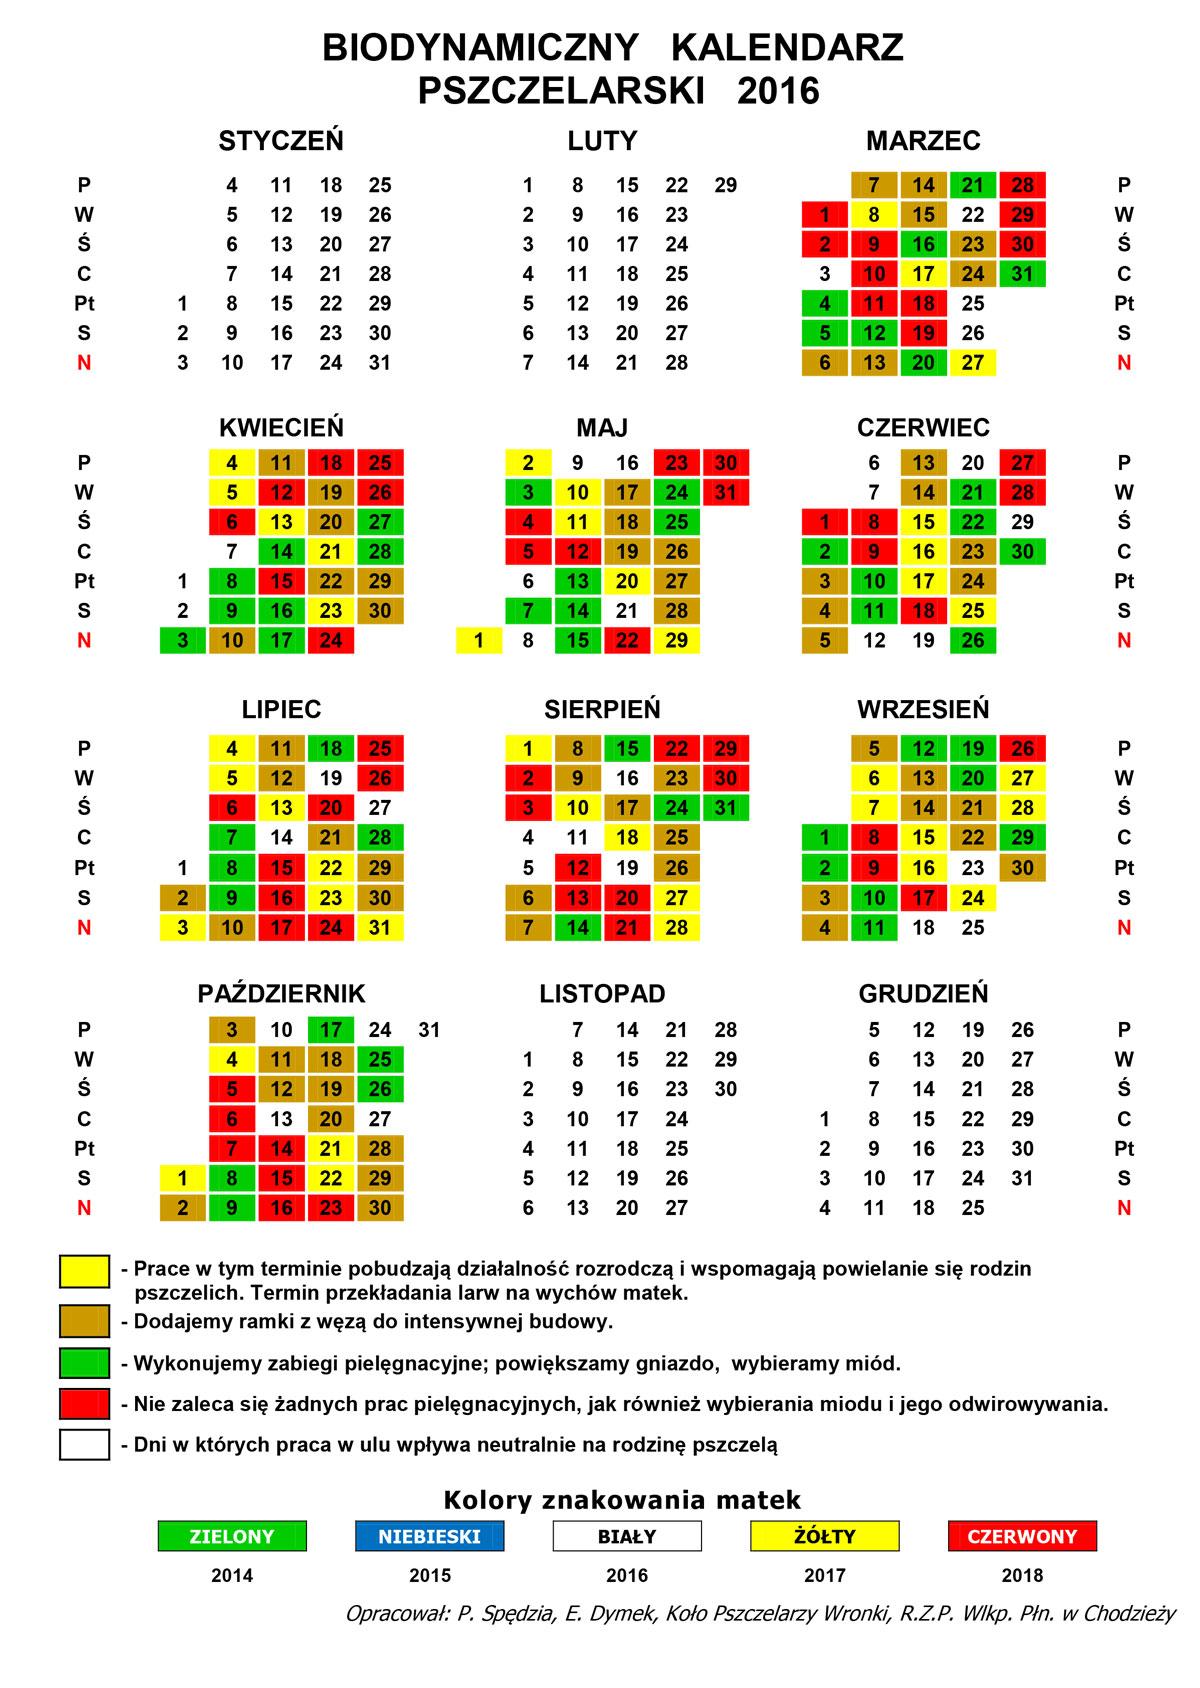 [Obrazek: 2016_kalendarz-biodynamiczny.jpg]